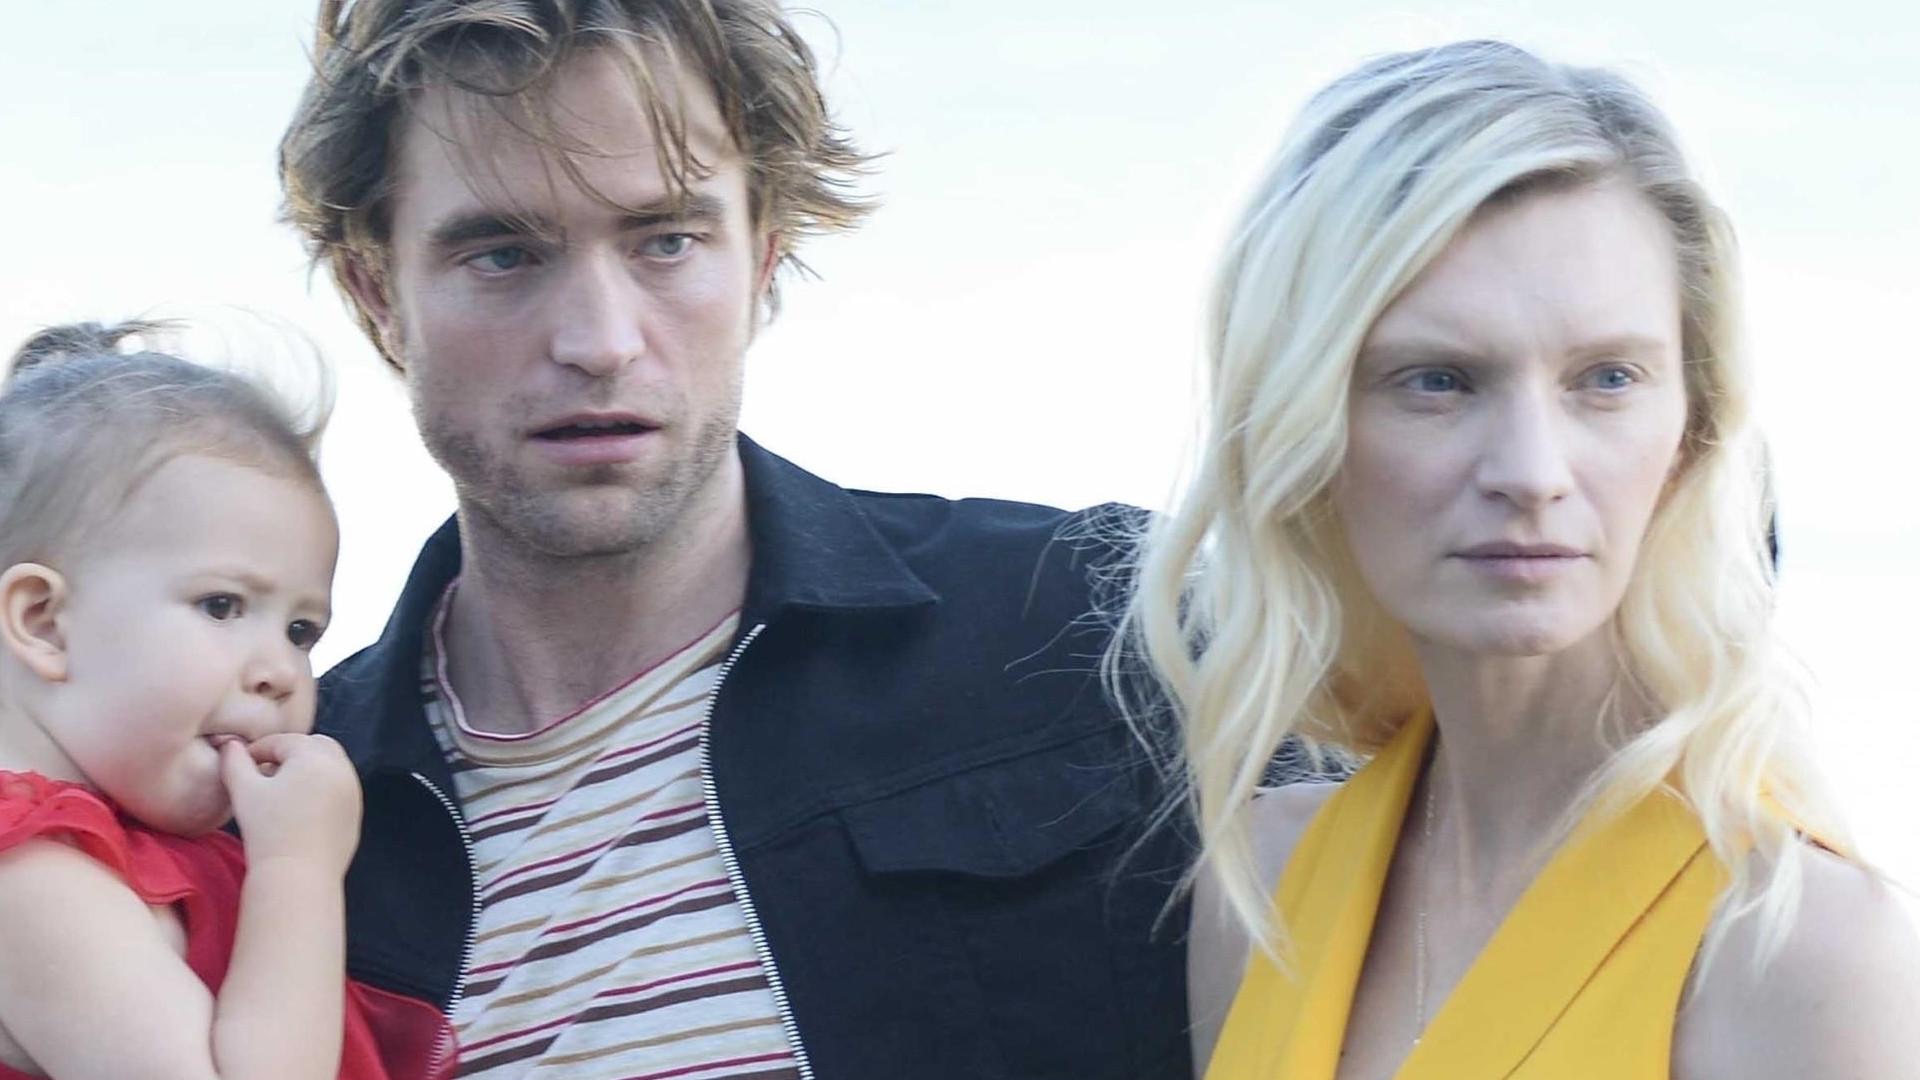 Agata Buzek u boku Roberta Pattinsona (ZDJĘCIA)